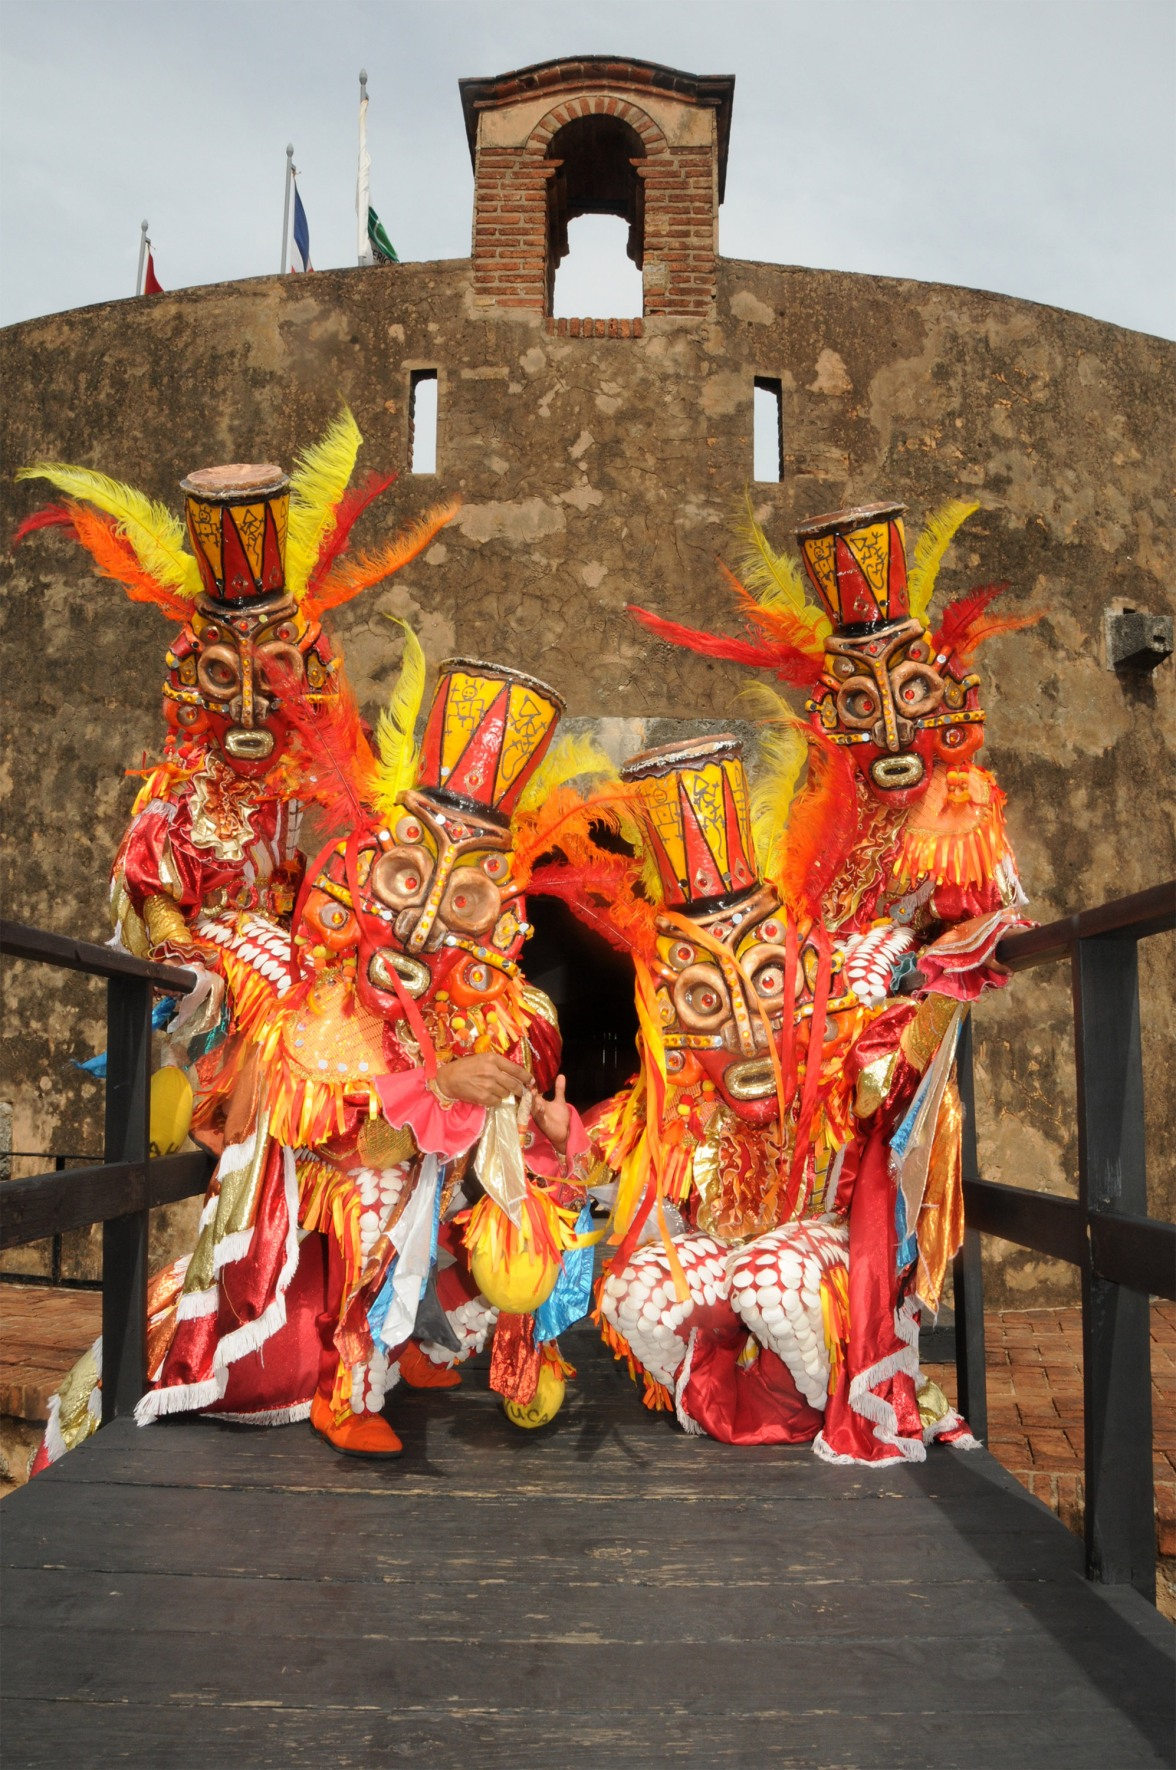 Carnaval at Dominican Republic